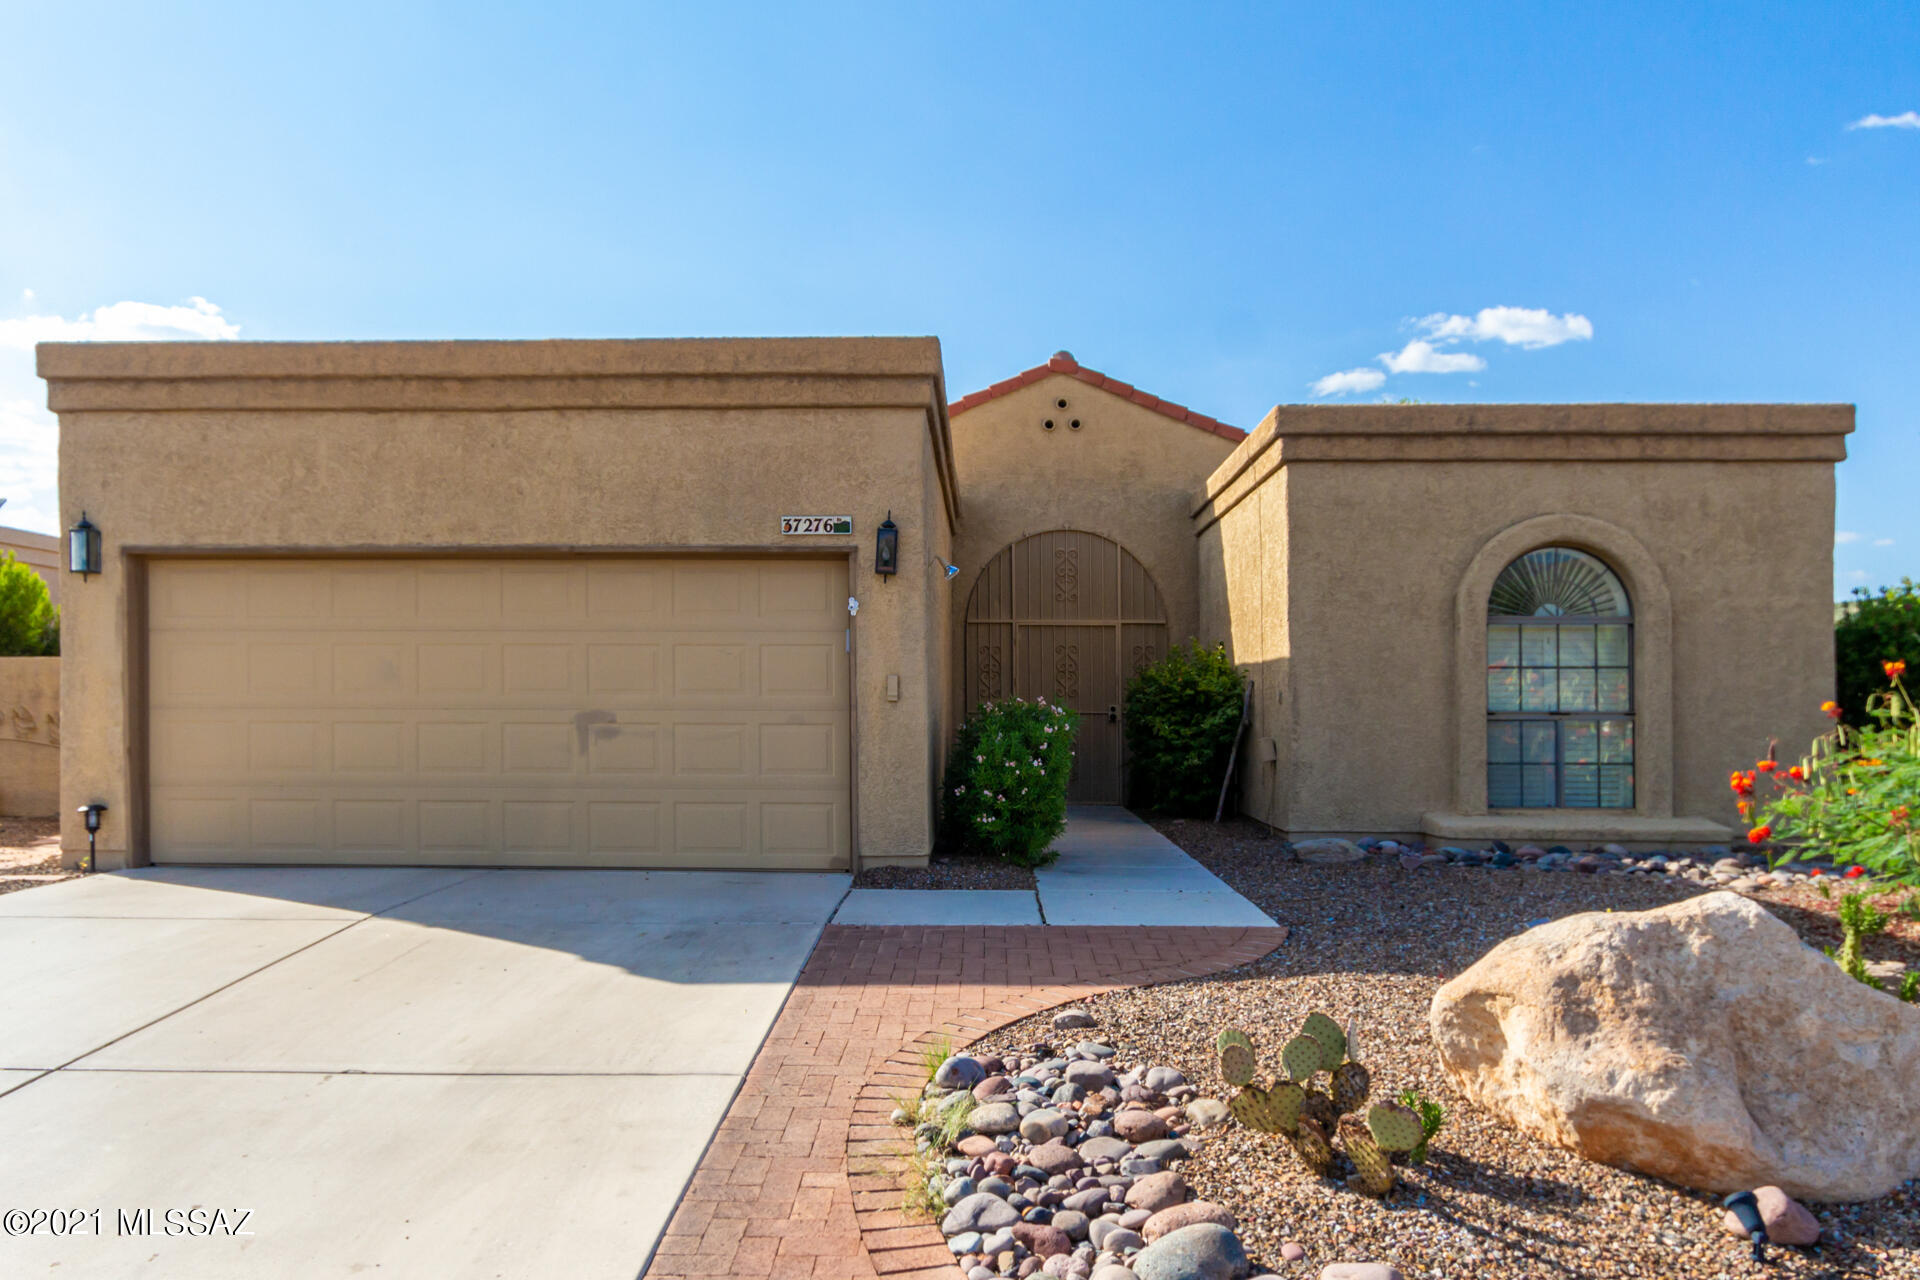 Photo of 37276 S Blackfoot Drive, Saddlebrooke, AZ 85739